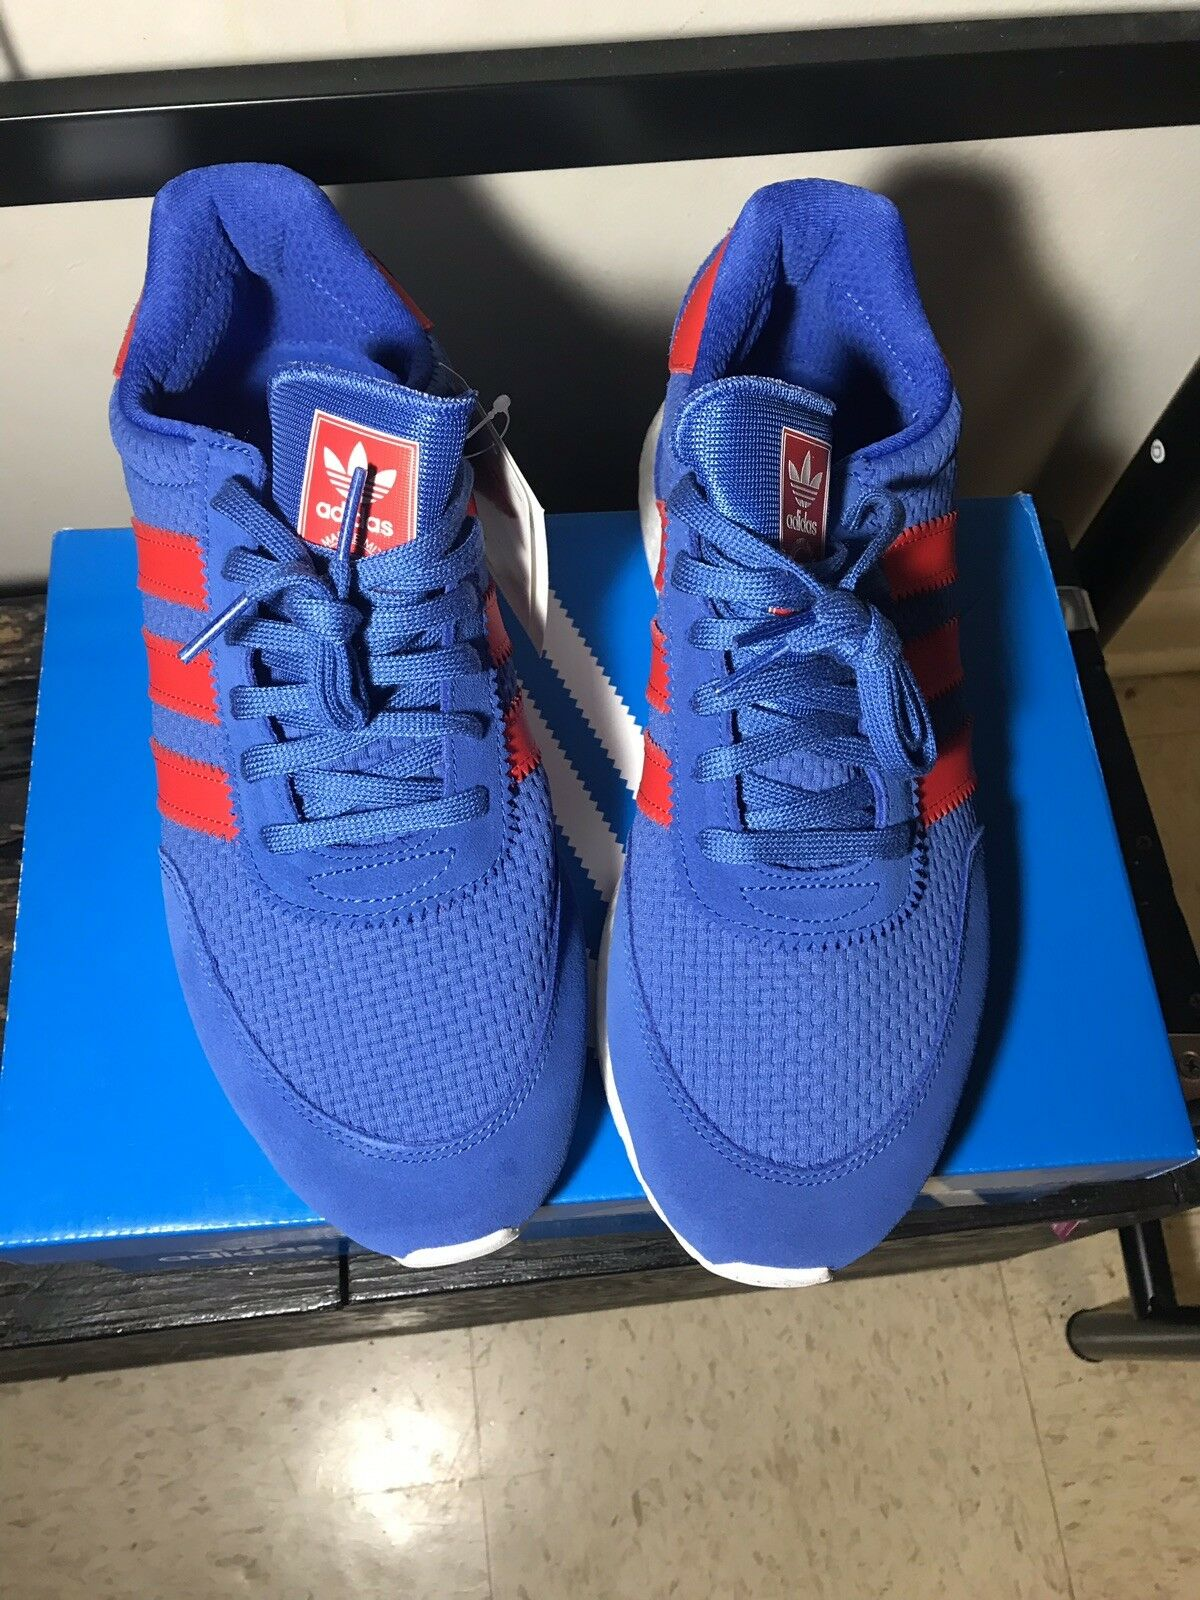 Adidas Originals Mens I-5923 Hi-Res bluee Solar Red - BRAND NEW IN BOX